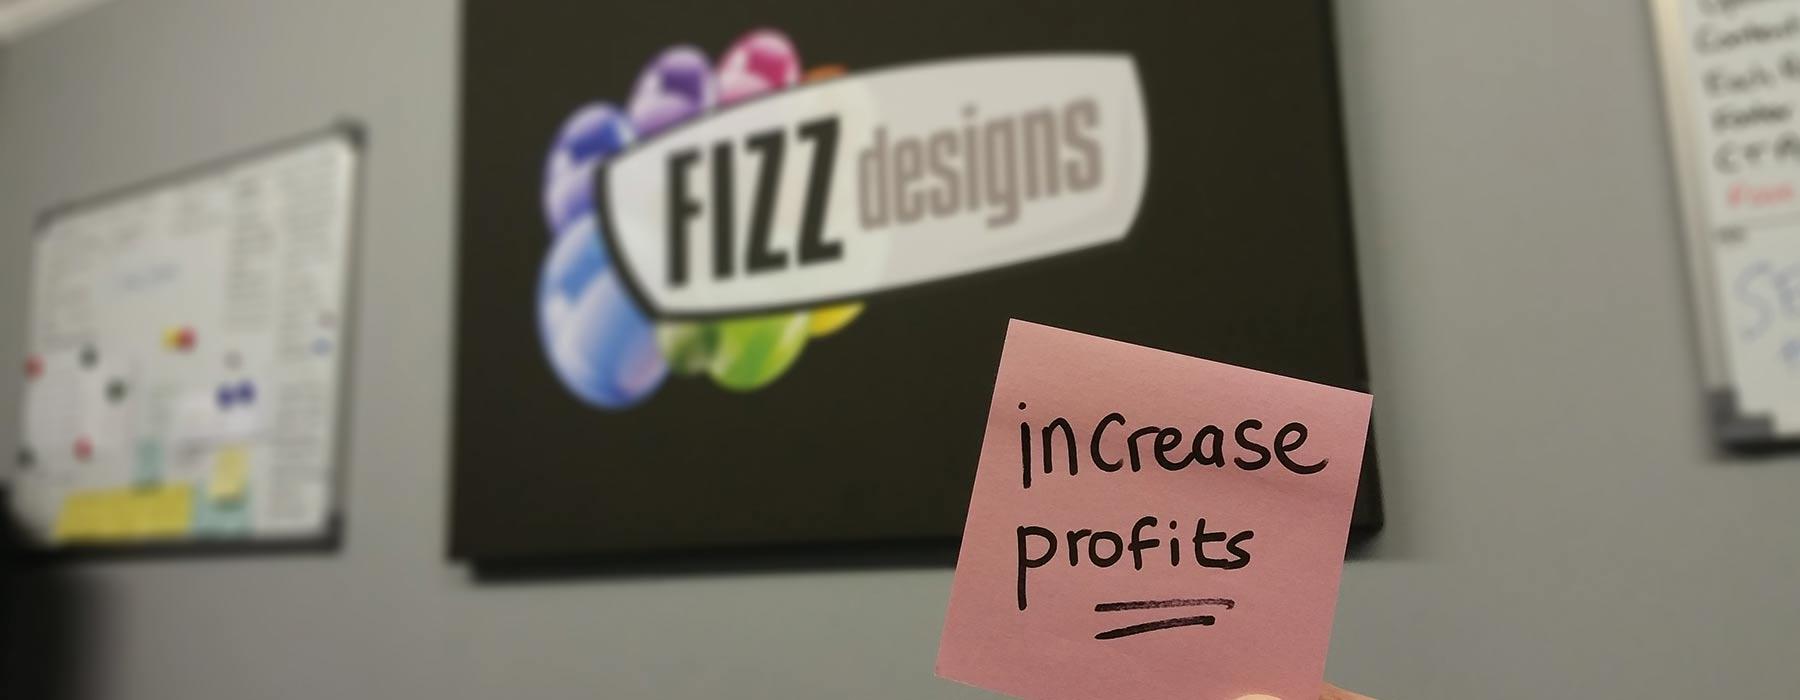 Increase Profits with FIZZ Internet Marketing